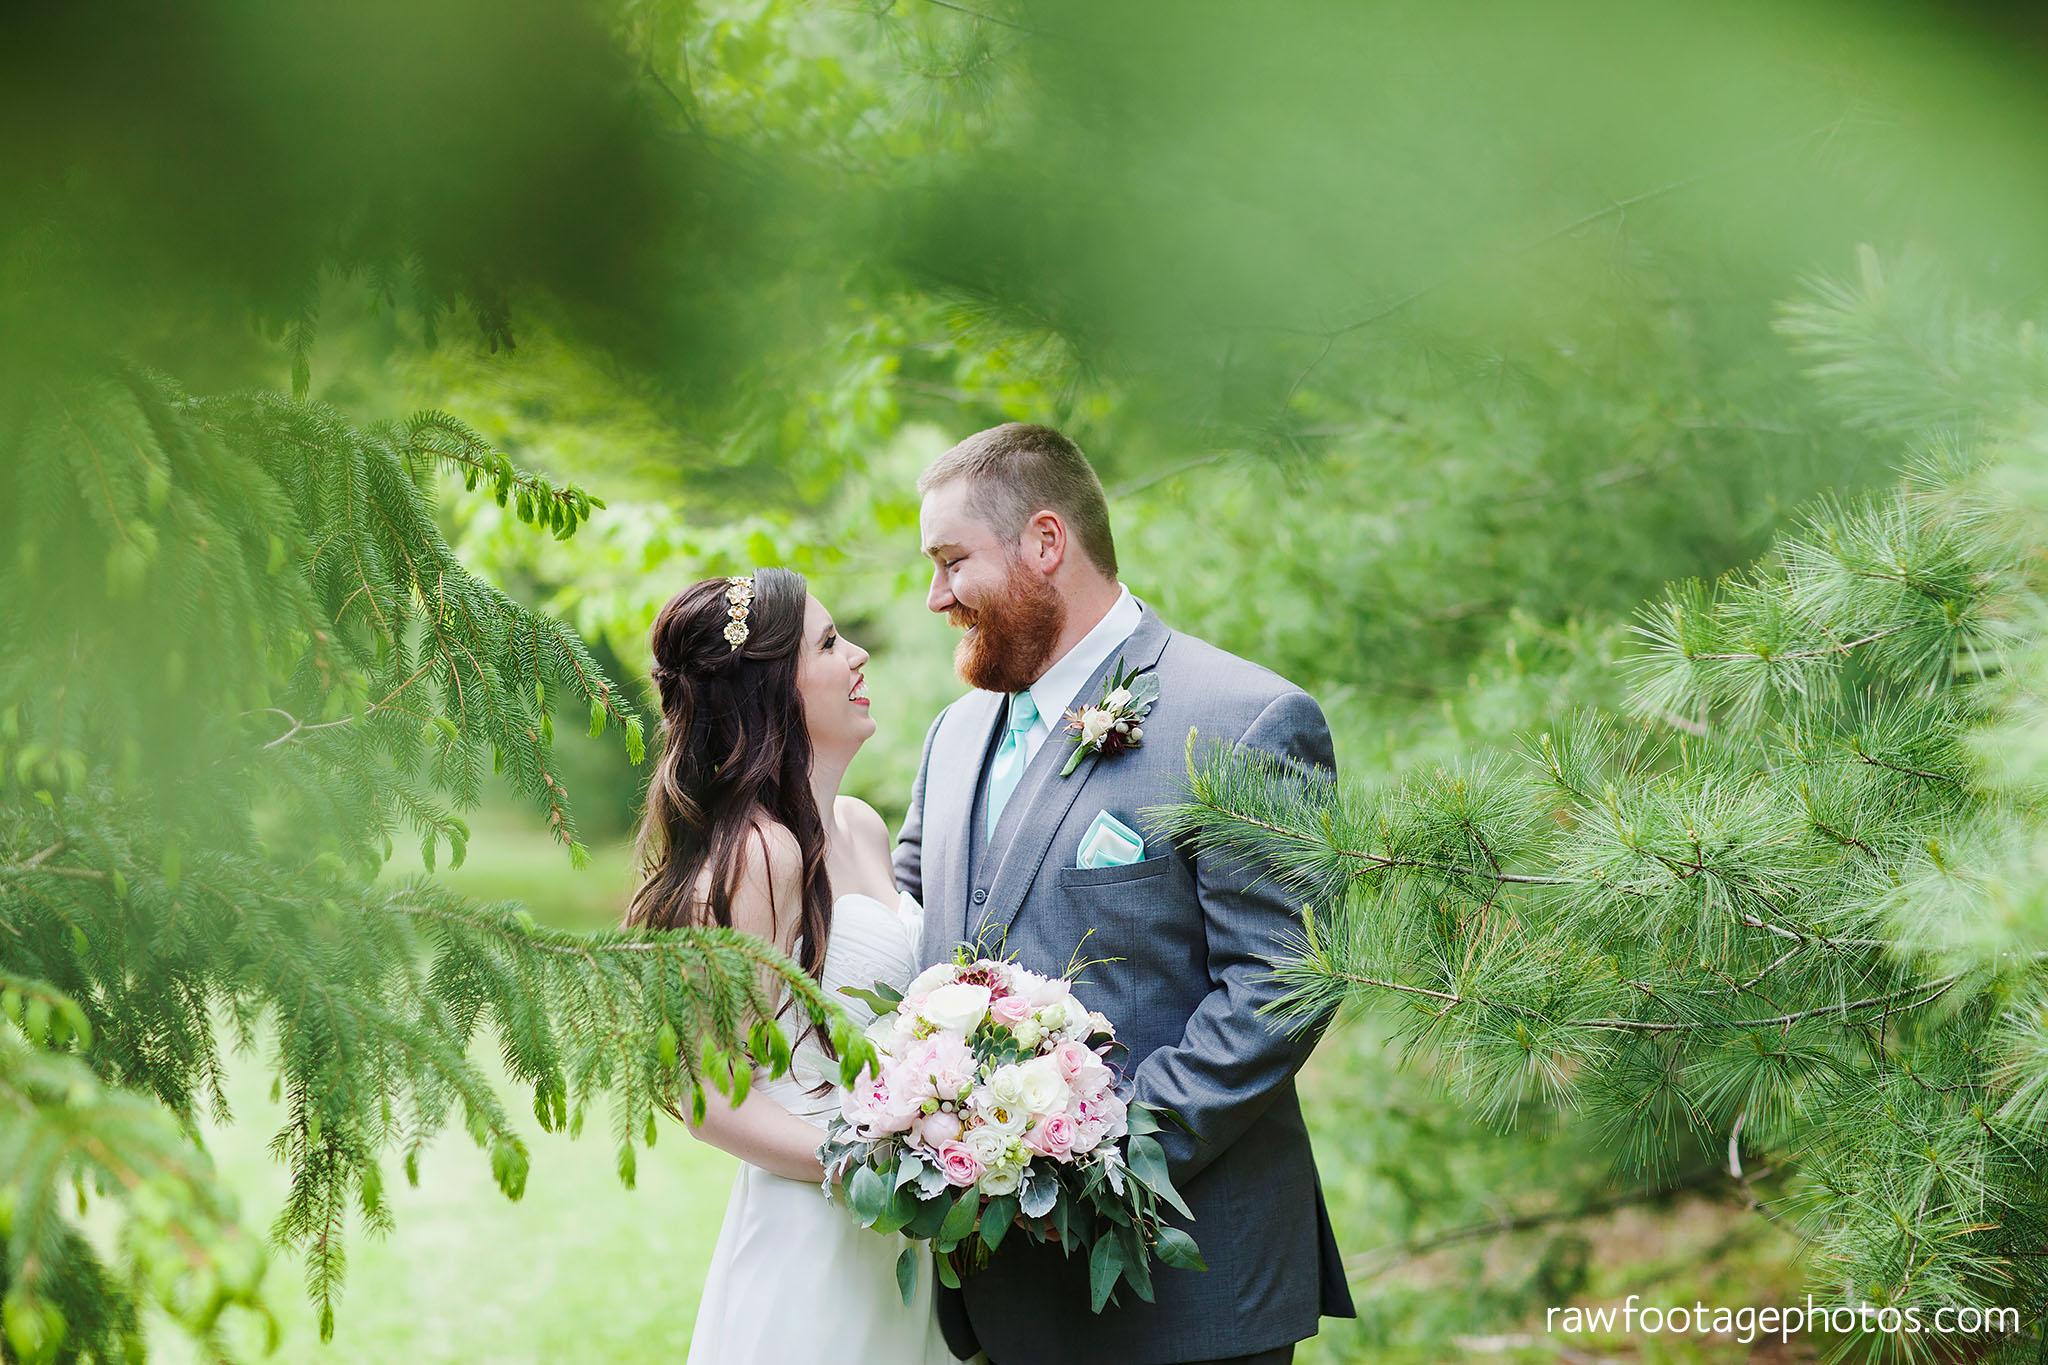 london_ontario_wedding_photographer-century_wedding_barn-raw_footage_photography-diy_wedding025.jpg